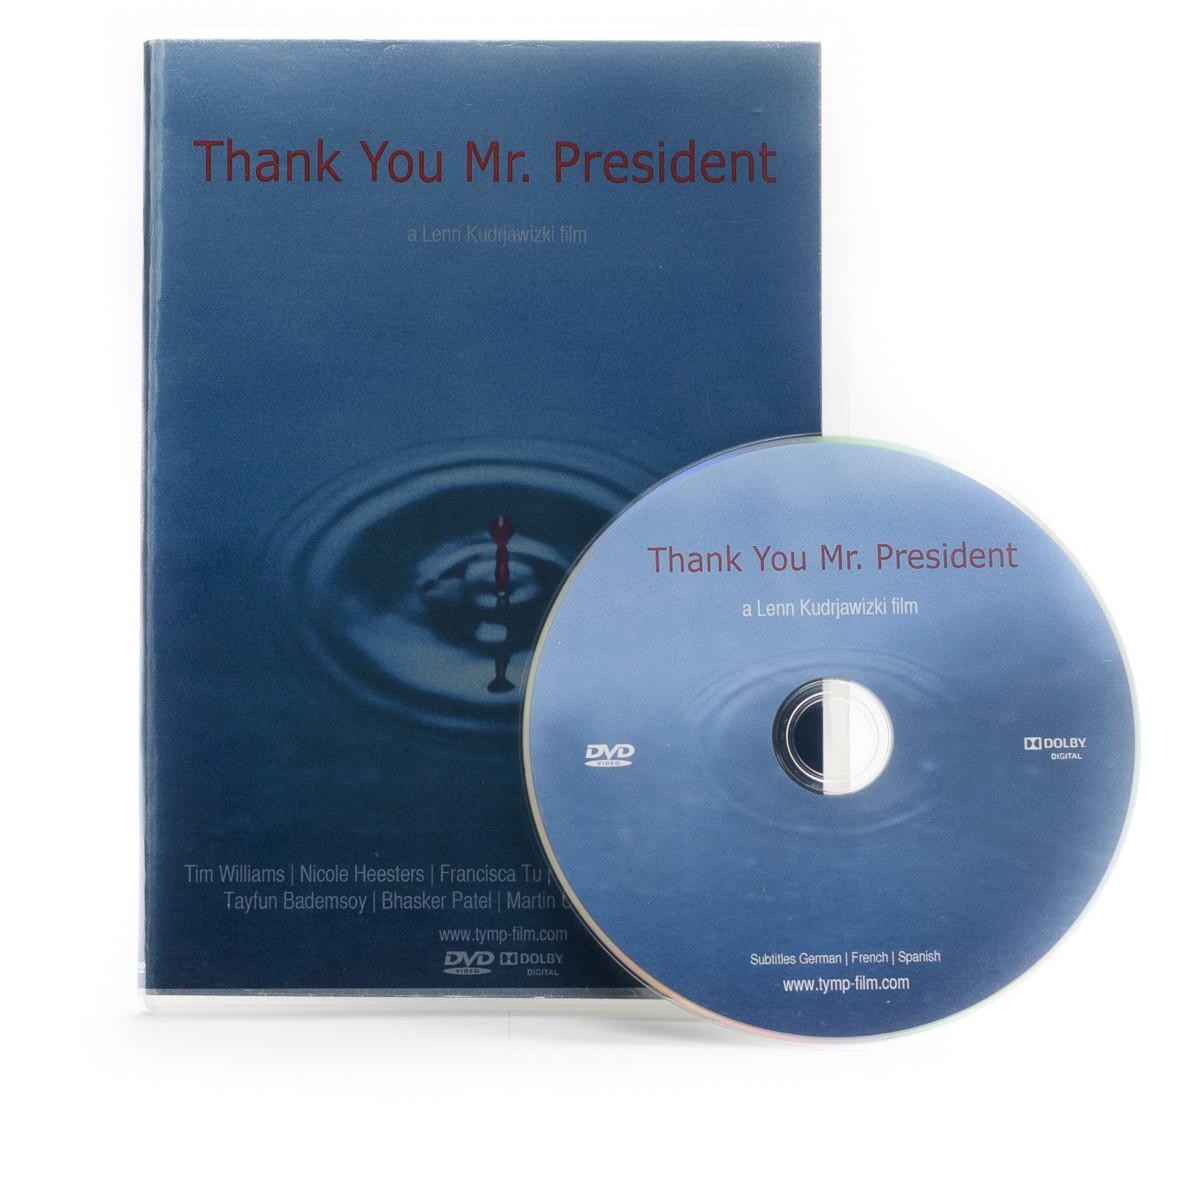 Thank You Mr. President (short film) DVD